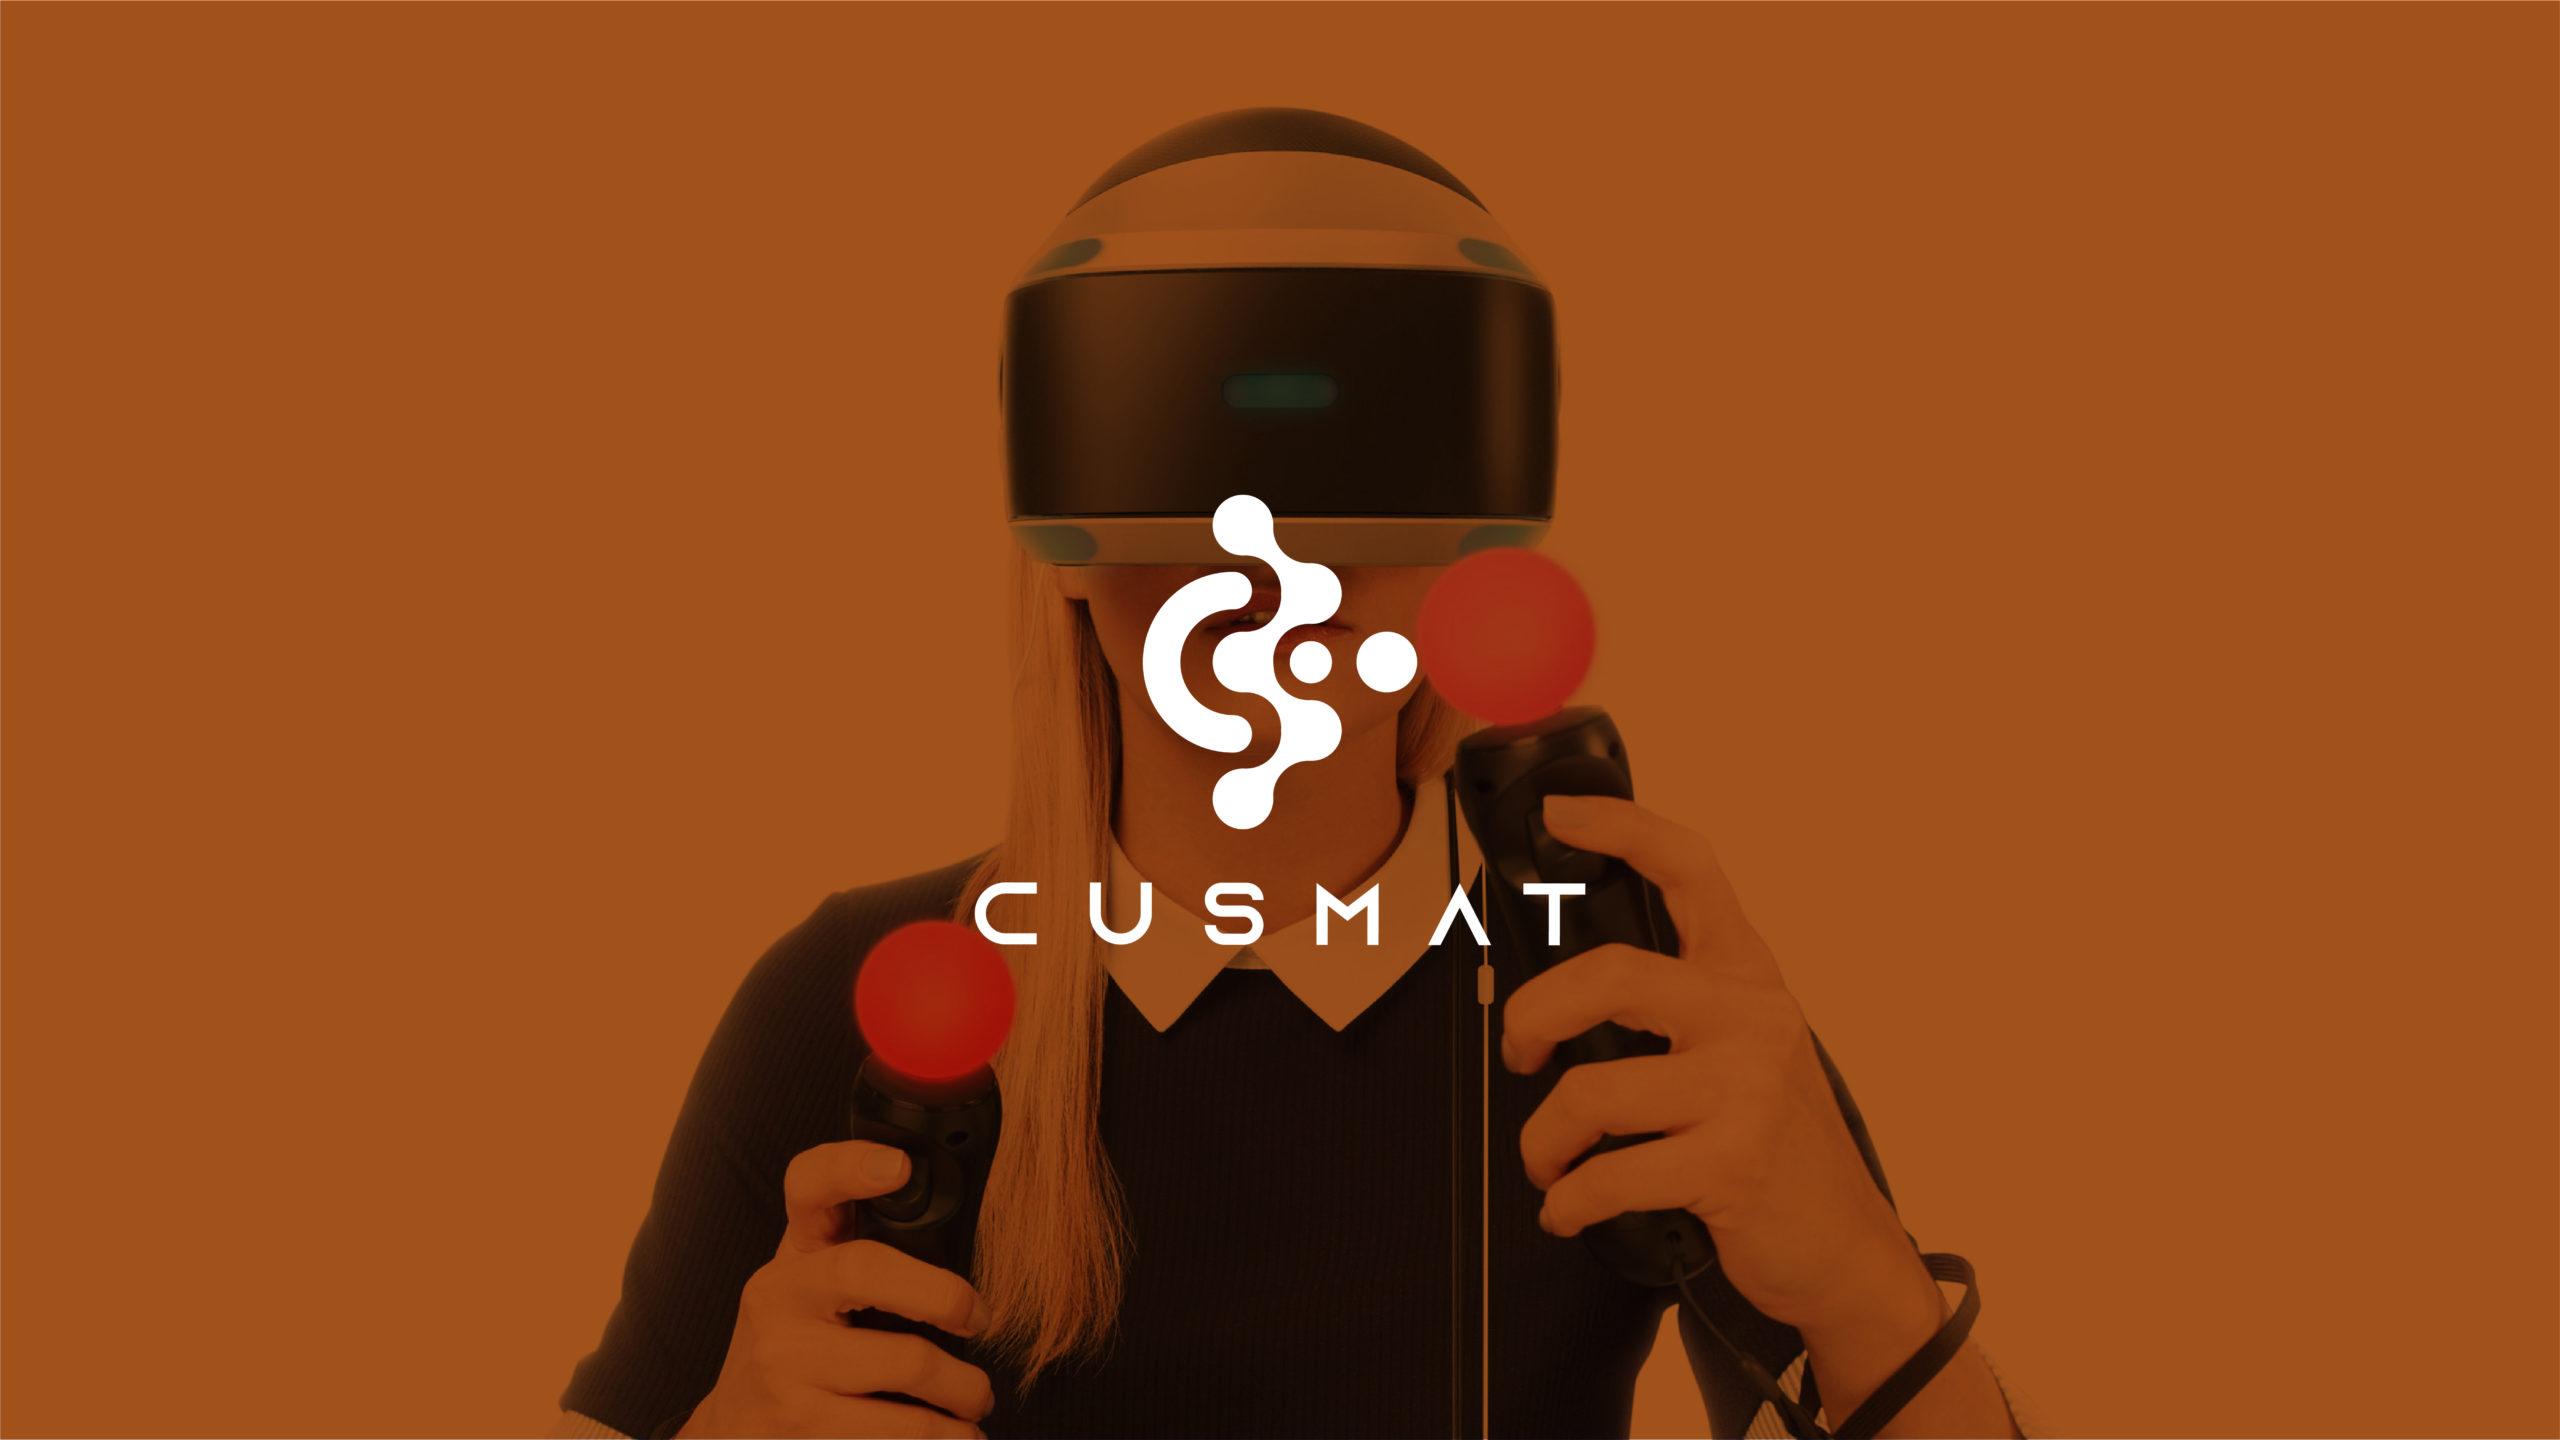 CUSMAT – IDENTITY DESIGN